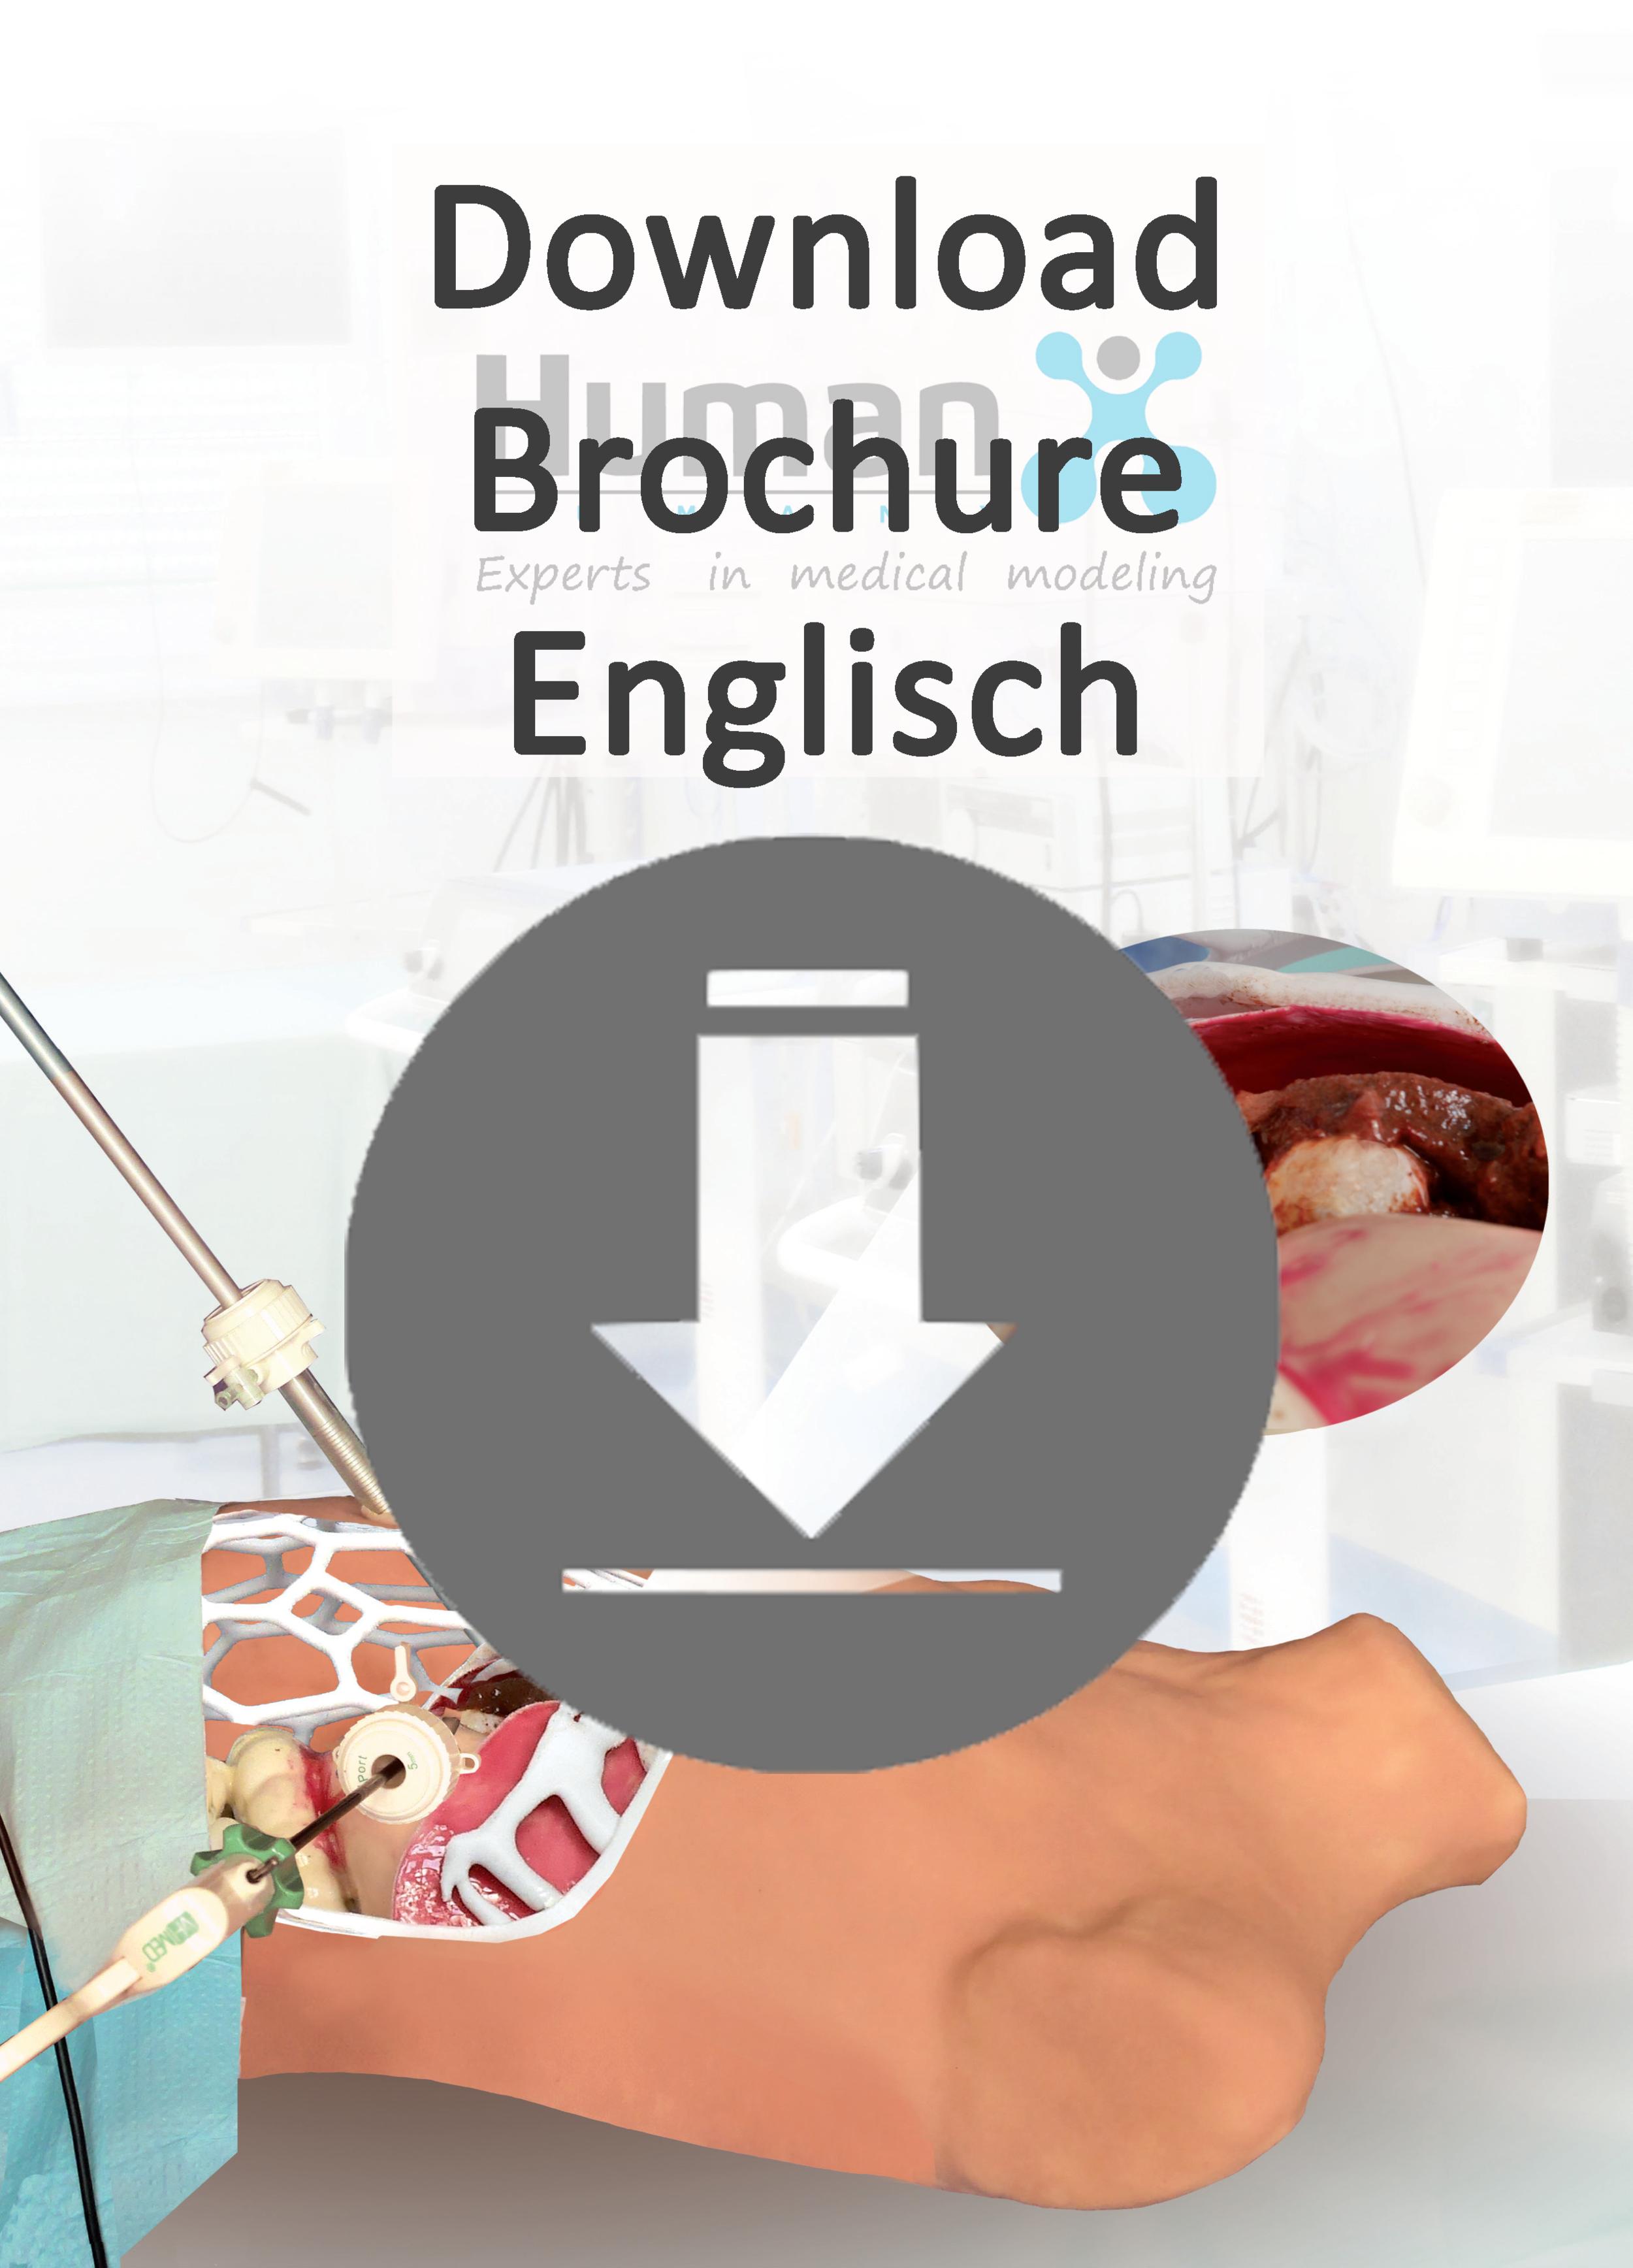 Download Brochure HumanX English (15 MB)